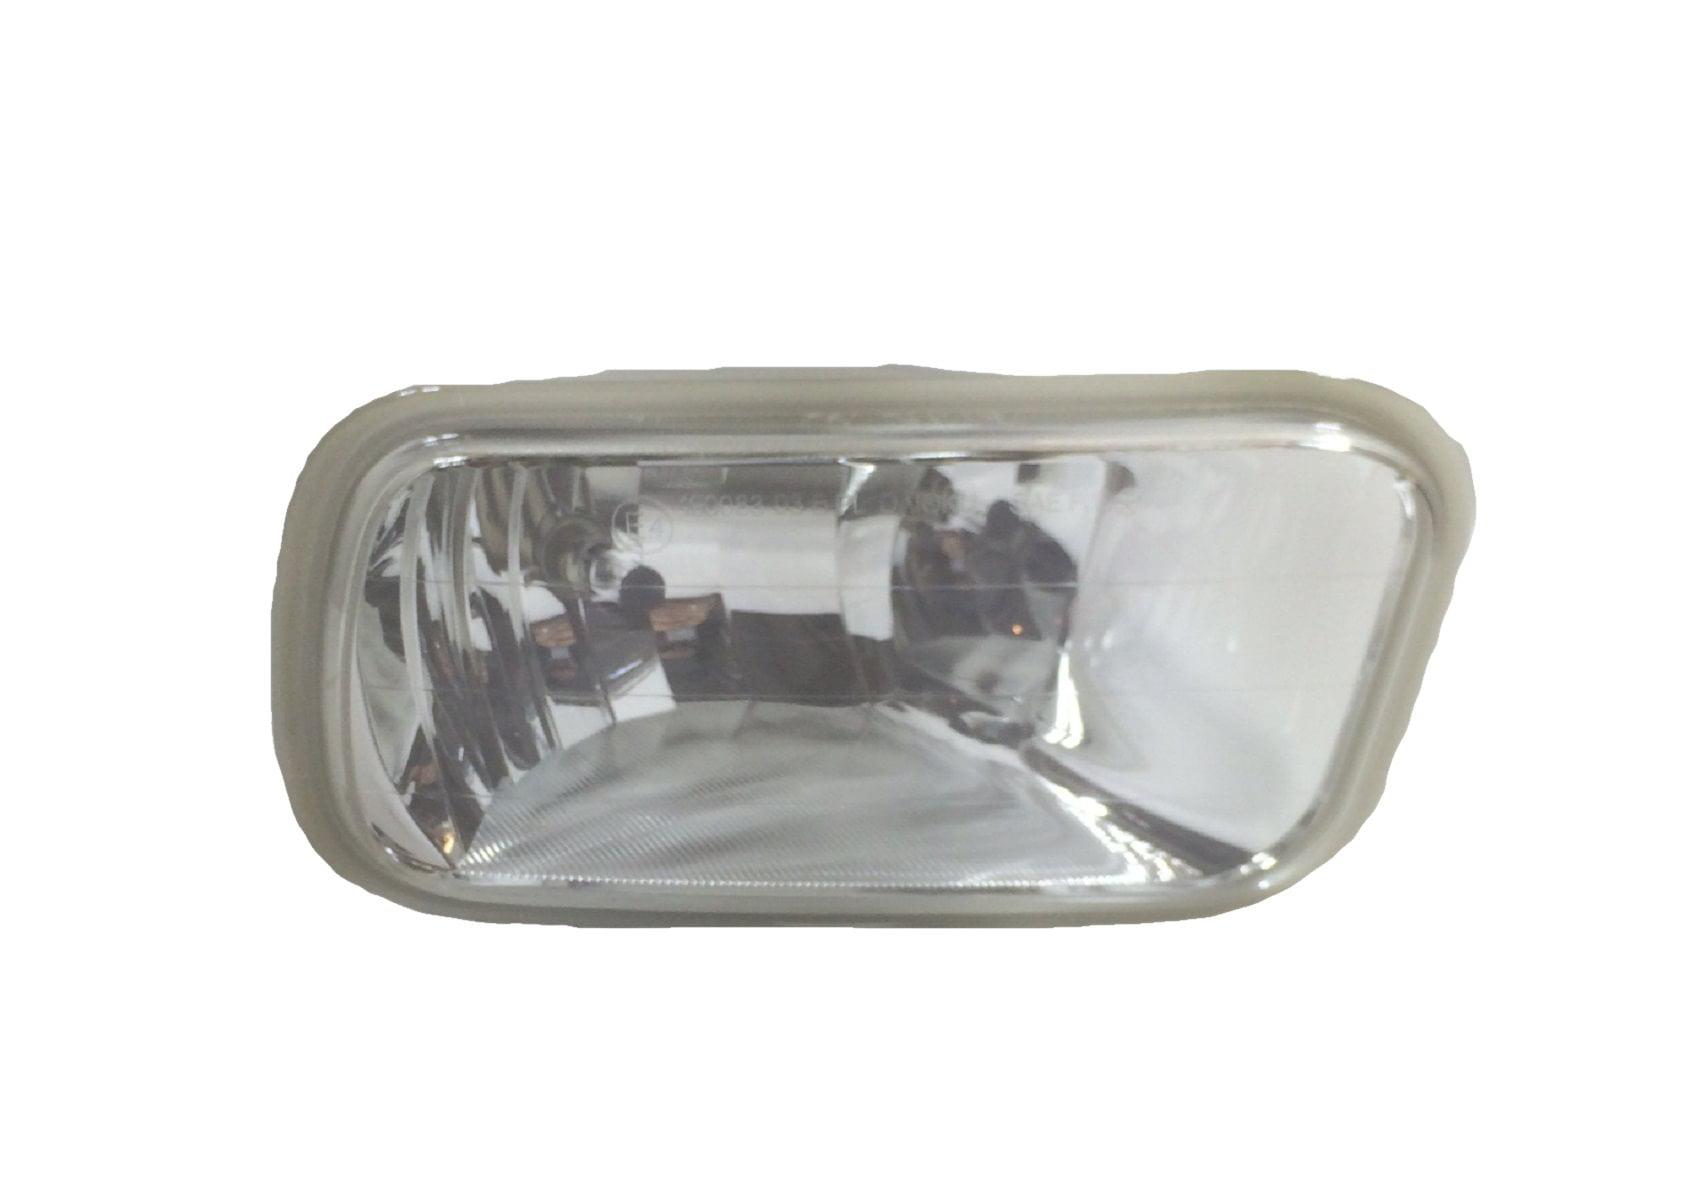 2019 DODGE RAM 1500 Driver Left Hand Side Mirror Cover Black NEW OEM MOPAR